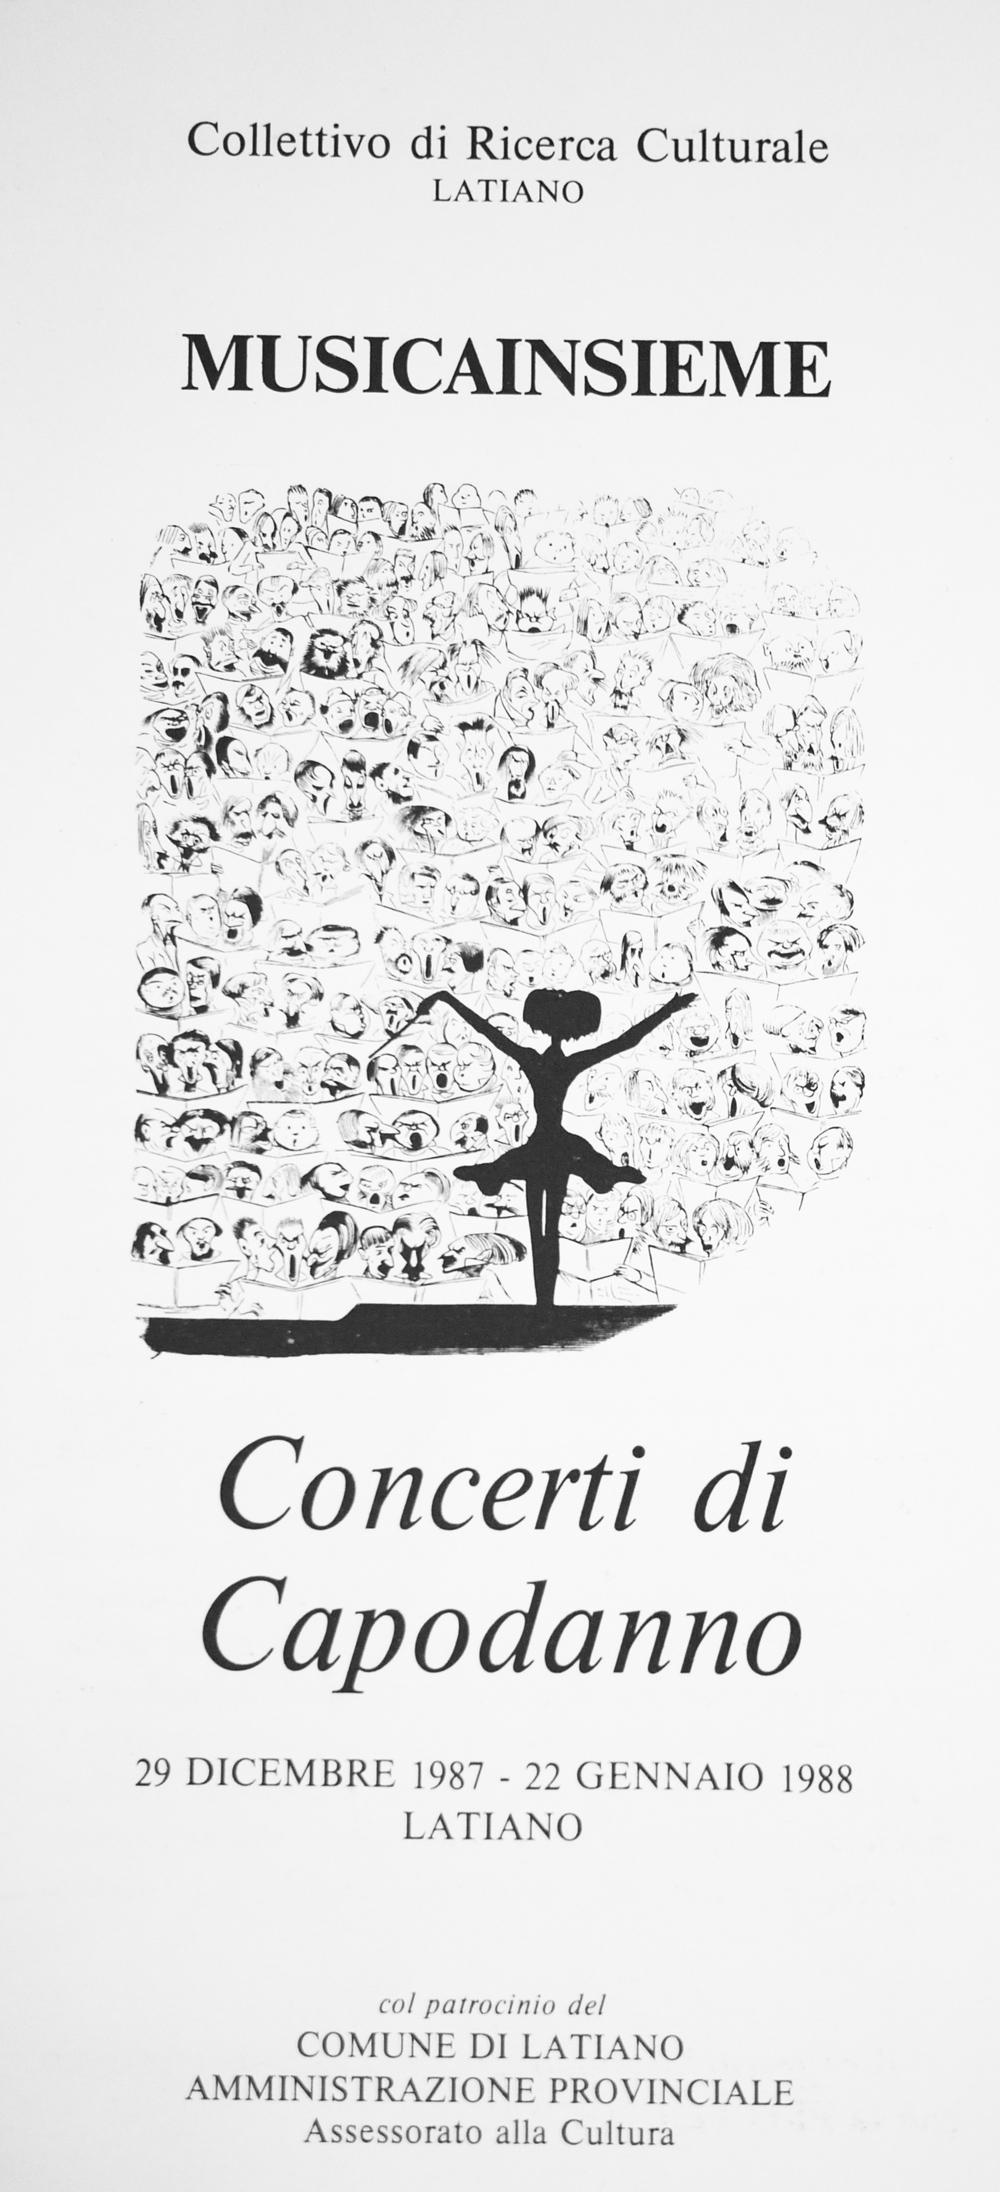 tenores ogliastra locandina Latiano 1987